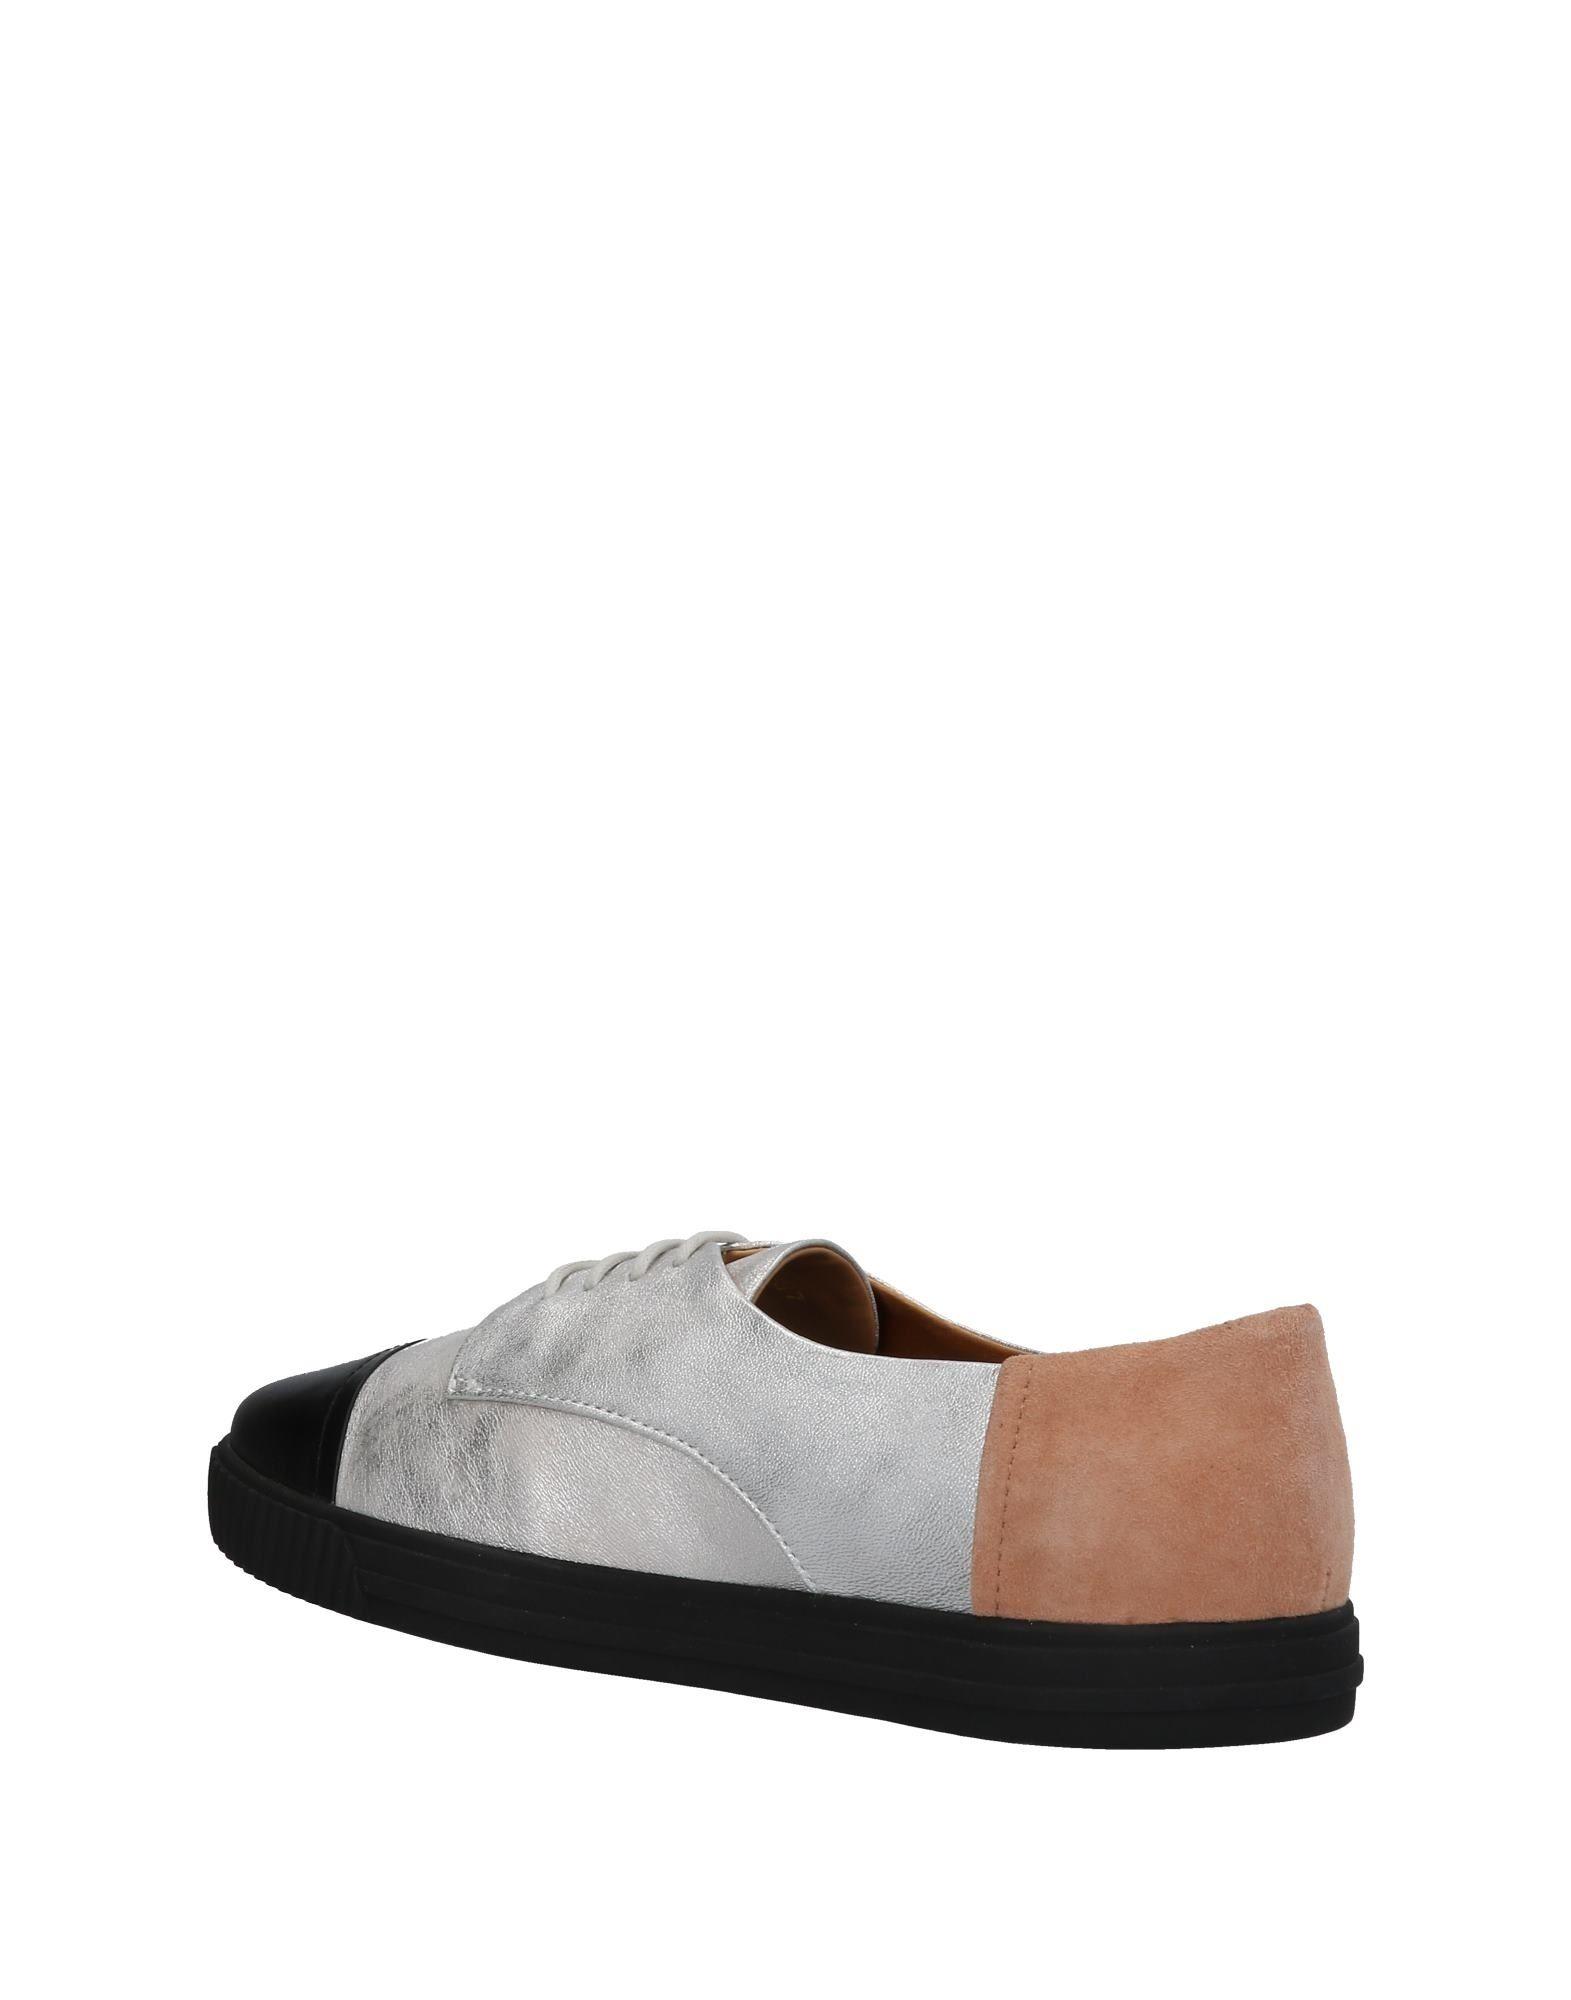 Geox Sneakers Damen Damen Sneakers  11414107AW  c9c546